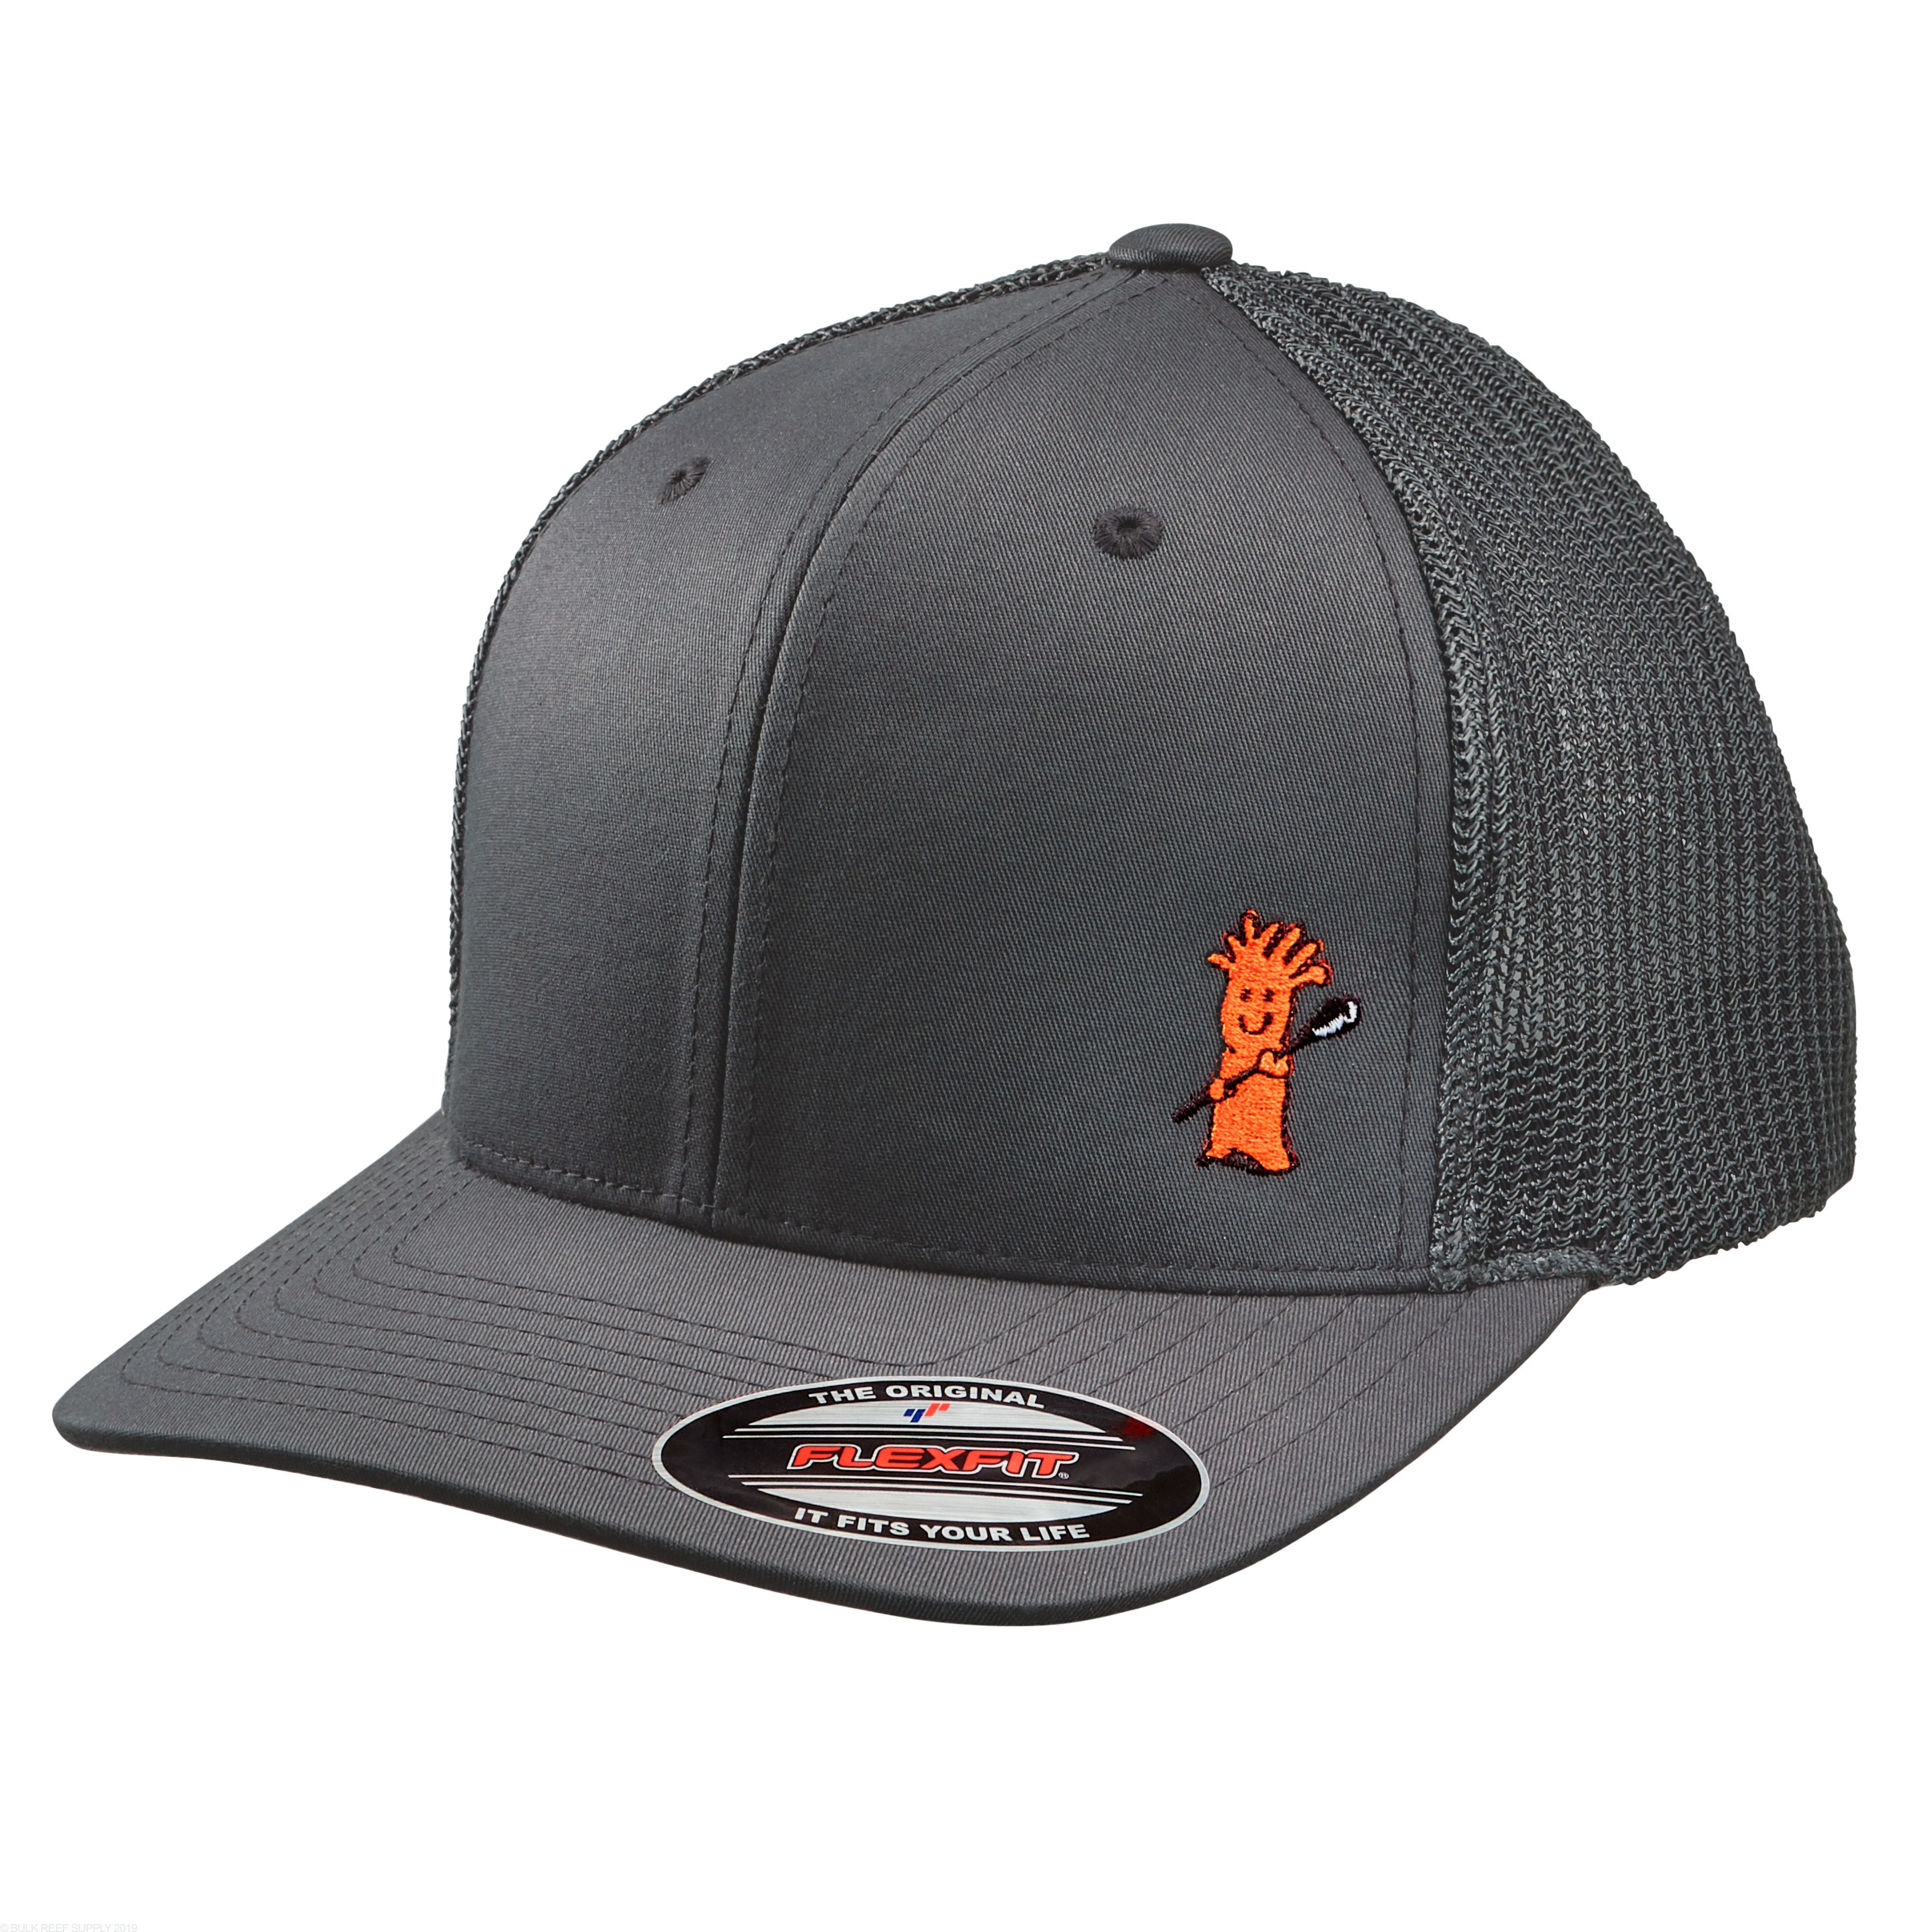 Mr. Chili Hat - FlexFit - Bulk Reef Supply - Bulk Reef Supply 39972946e33